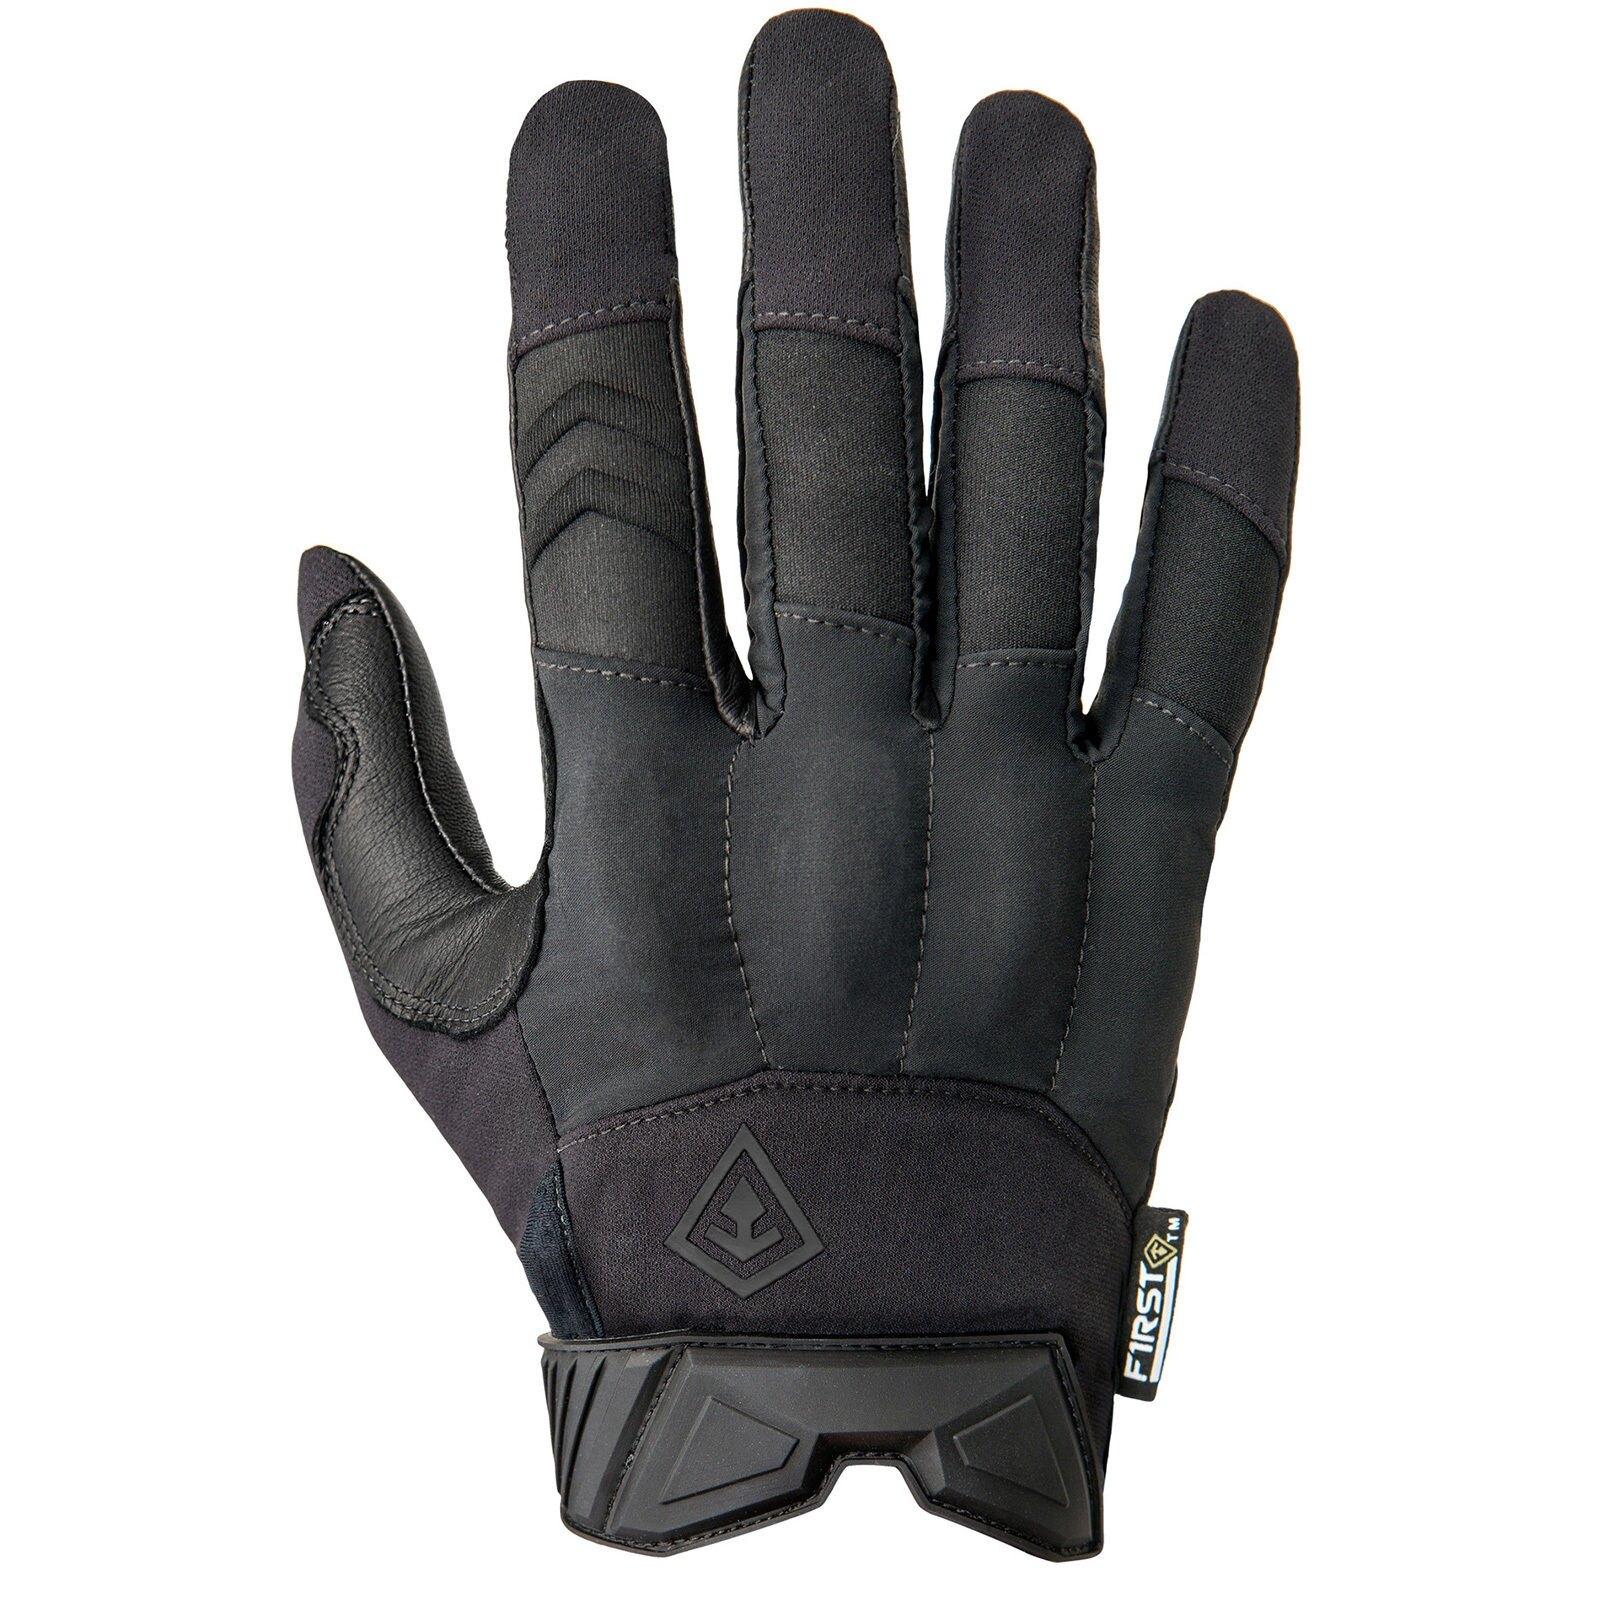 Strelecké rukavice First Tactical® Hard Knuckle - čierne (Veľkosť: M)